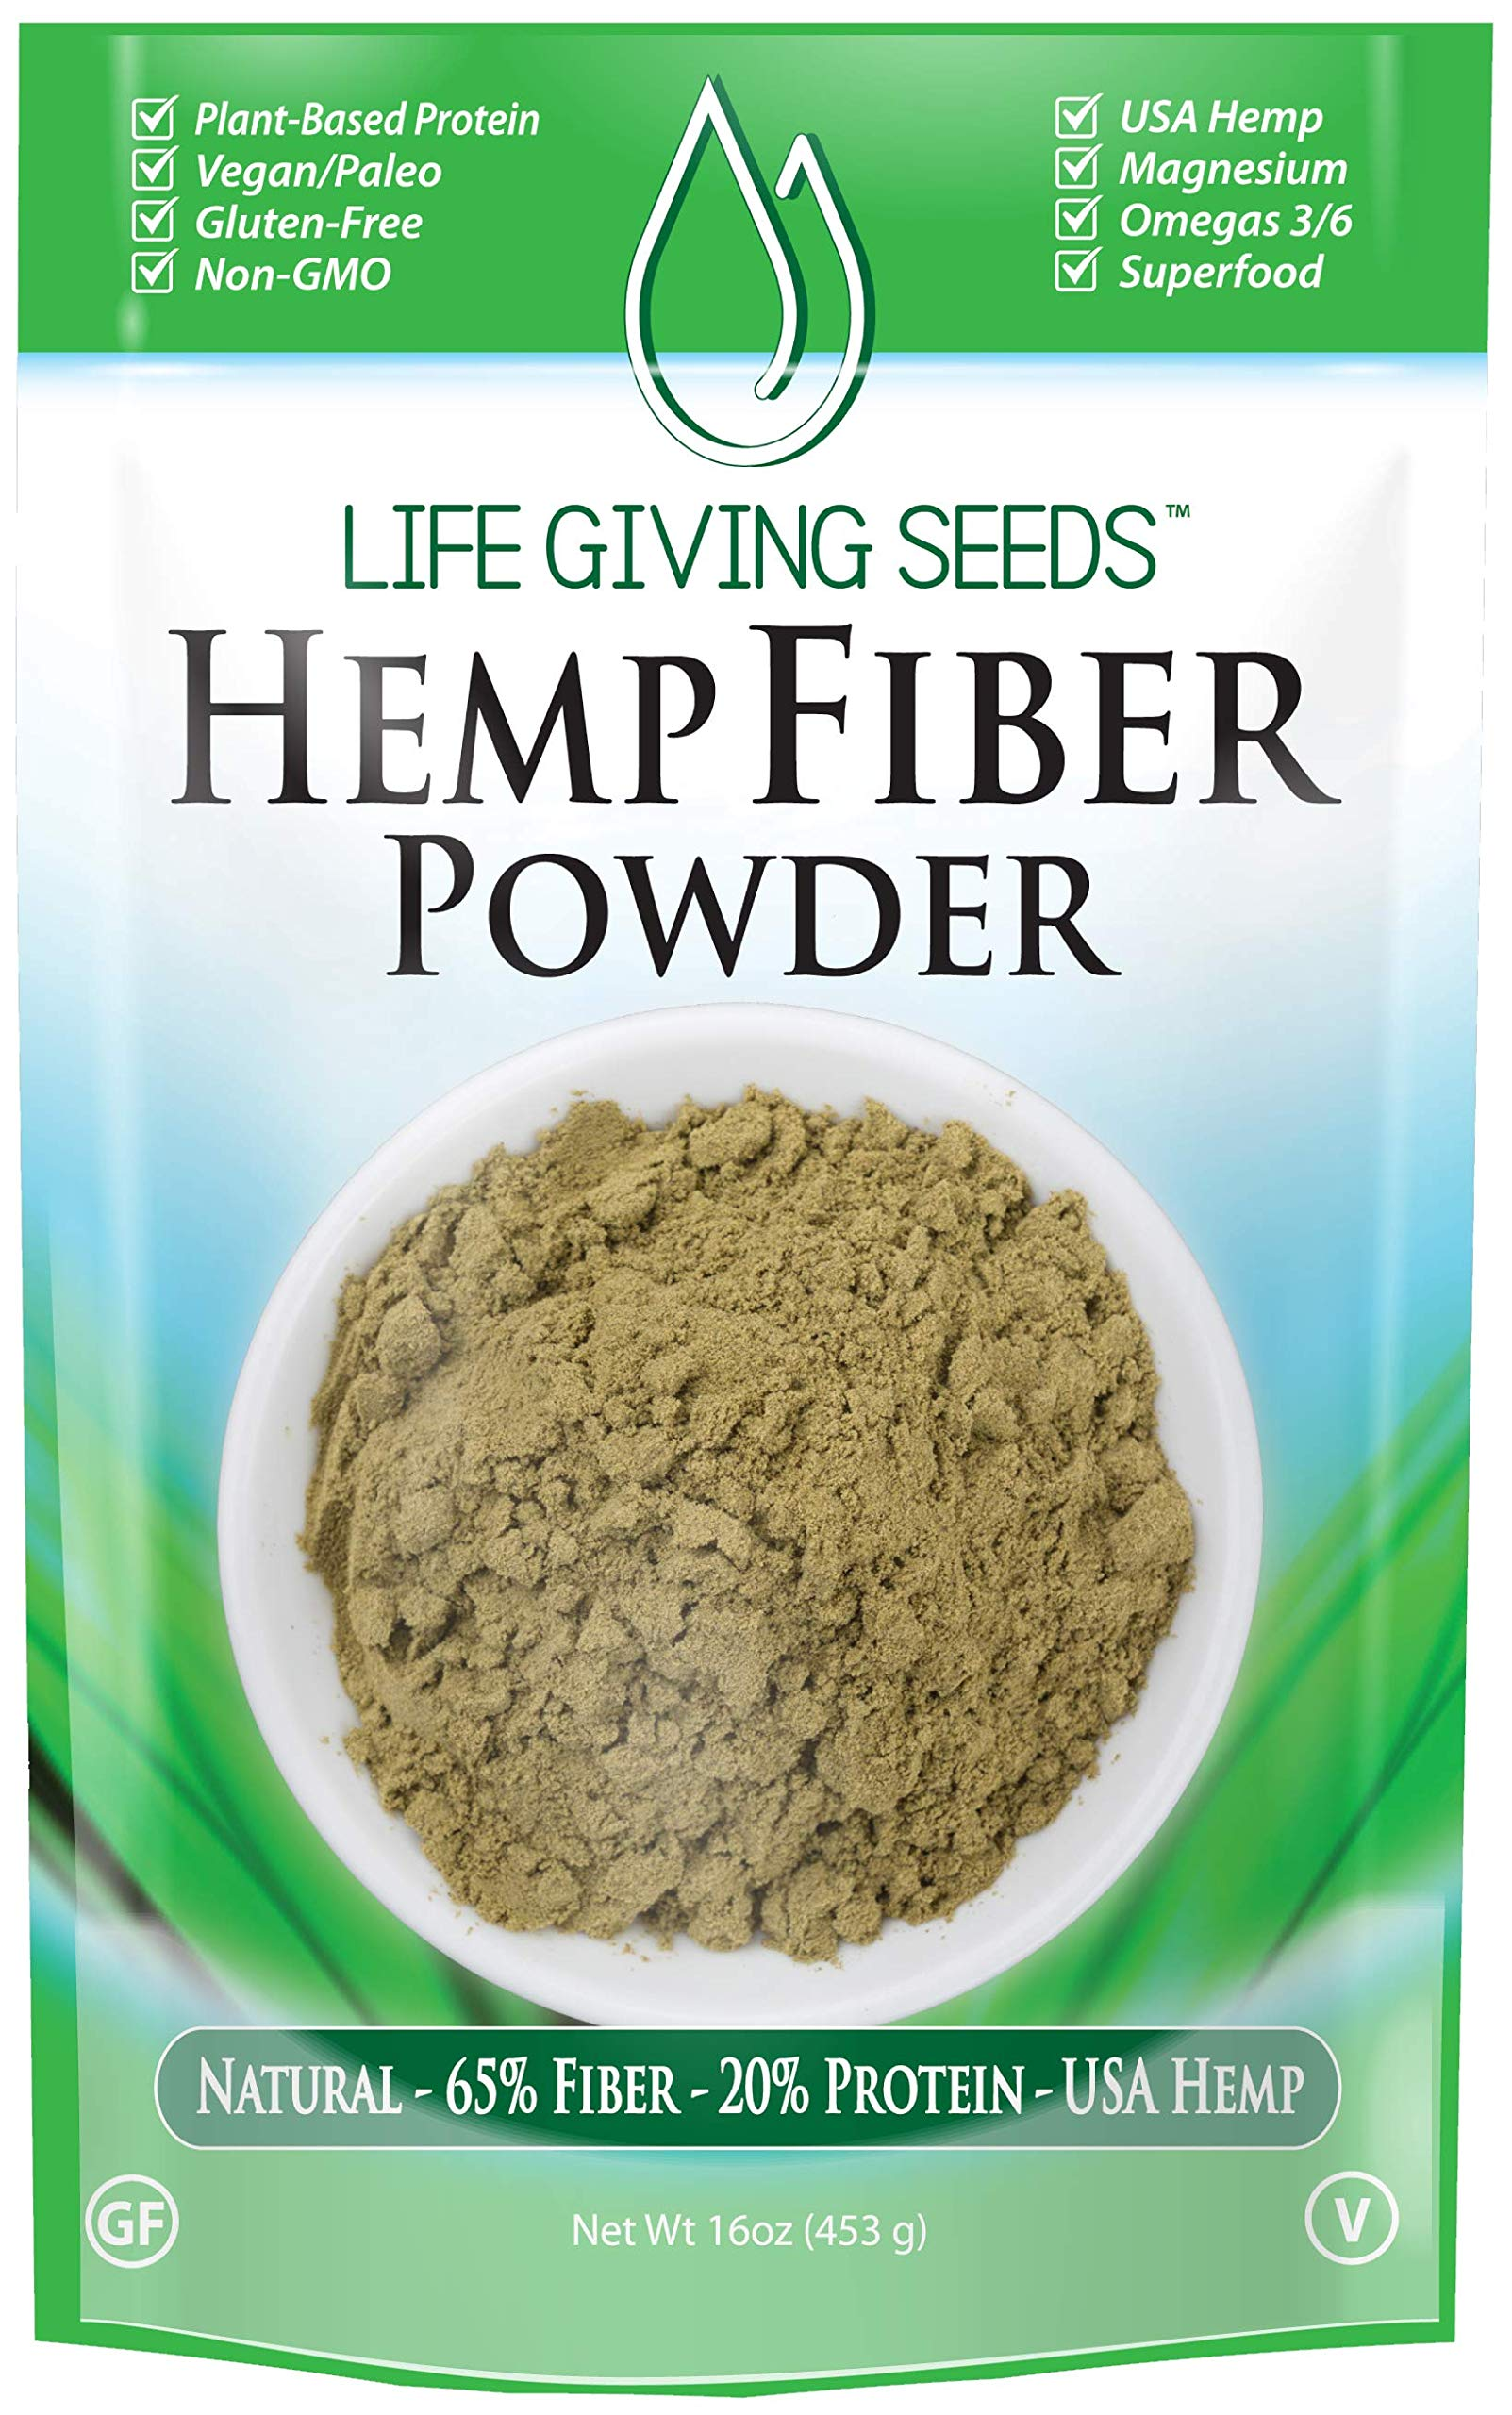 USA Hemp Protein High Fiber Powder 16oz | Plant Based | Superfood | non GMO | USA